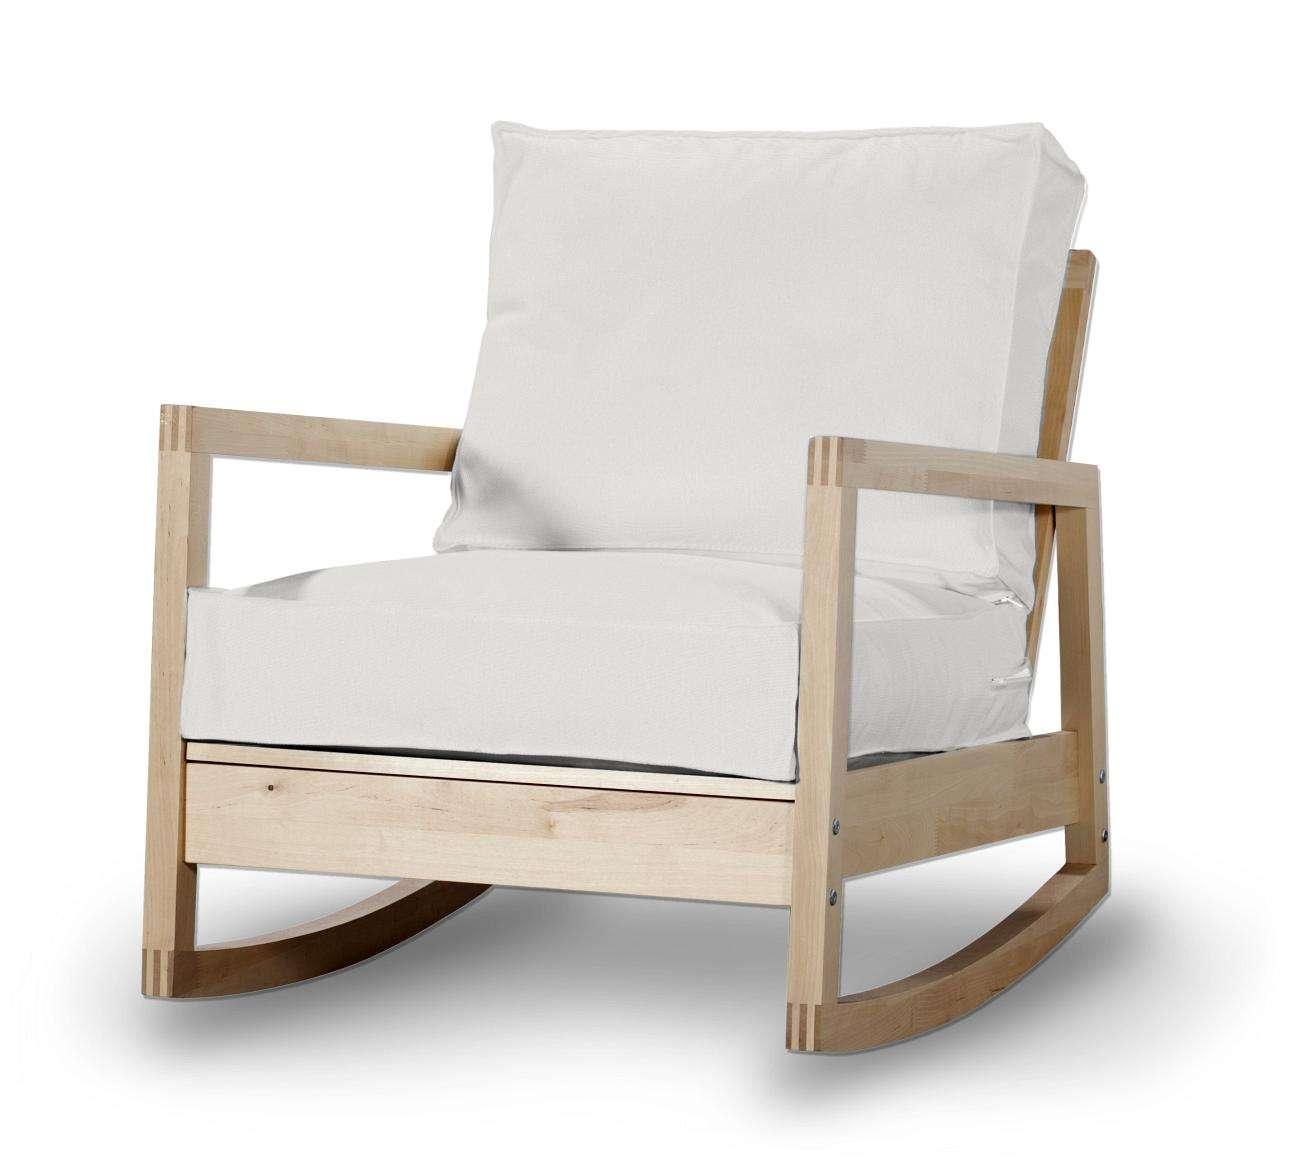 Lillberg Sesselbezug Sesselhusse, Modell Lillberg von der Kollektion Etna, Stoff: 705-01